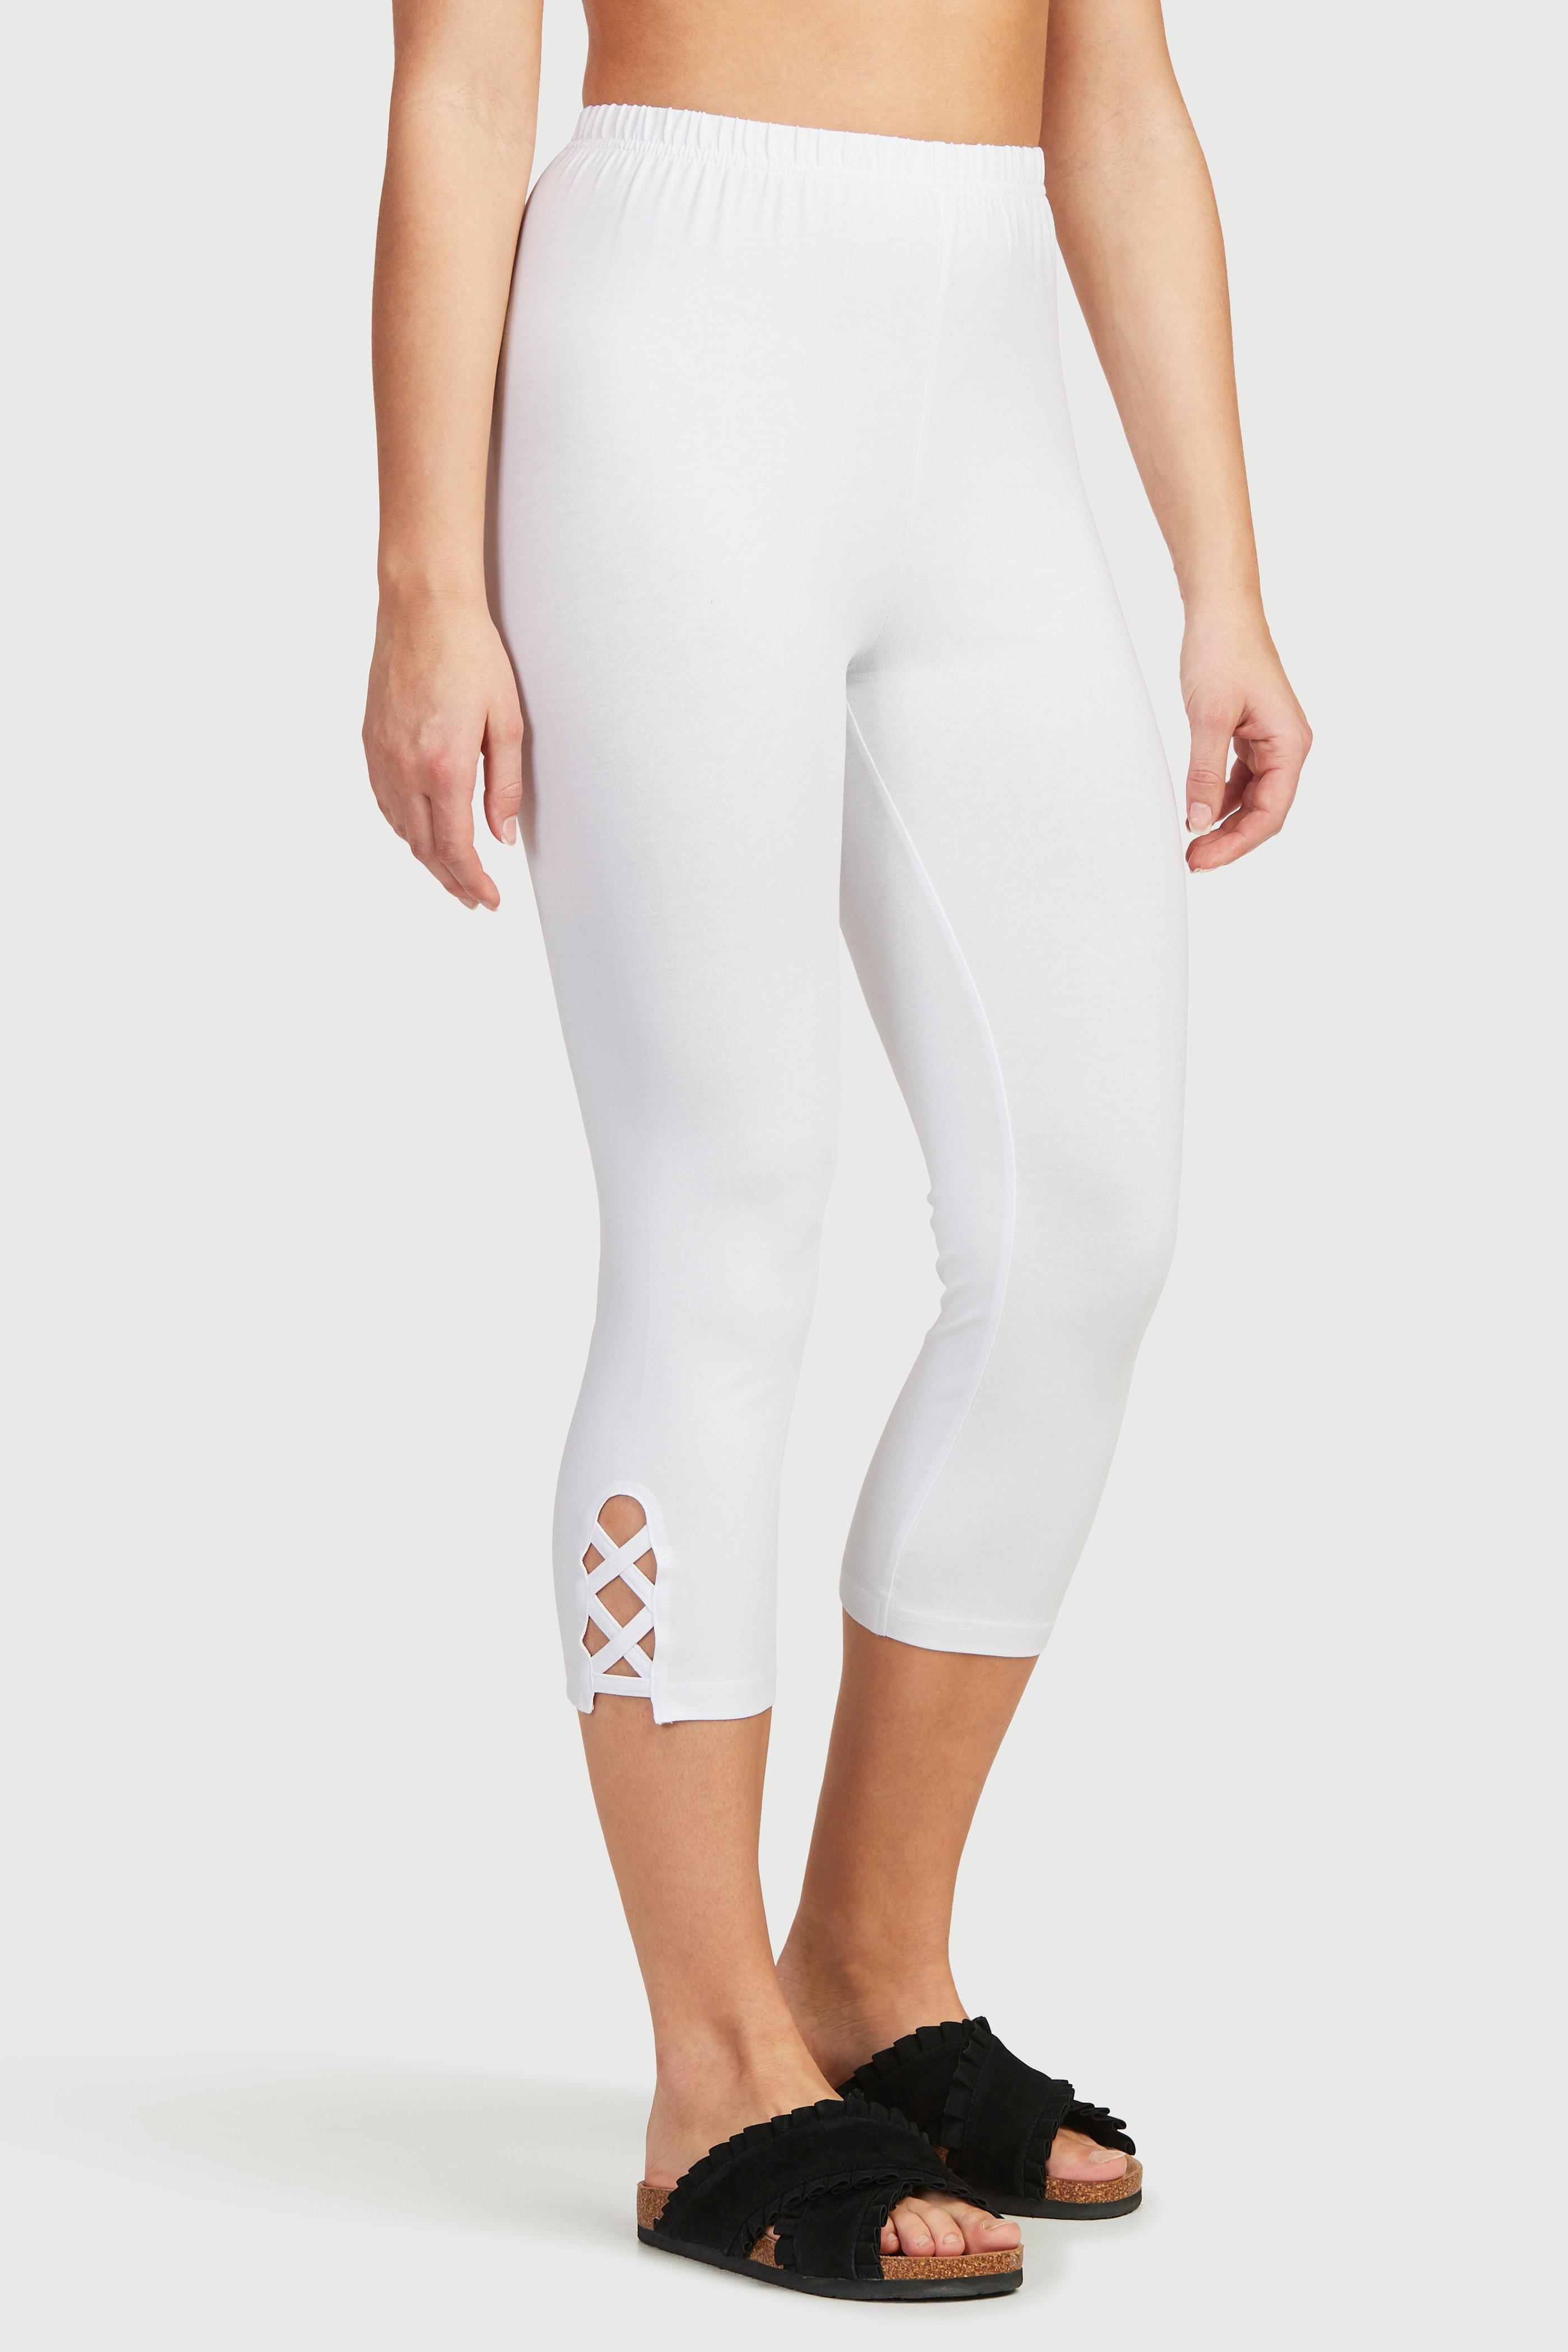 Capripituiset leggingsit 2 kpl/pakkaus